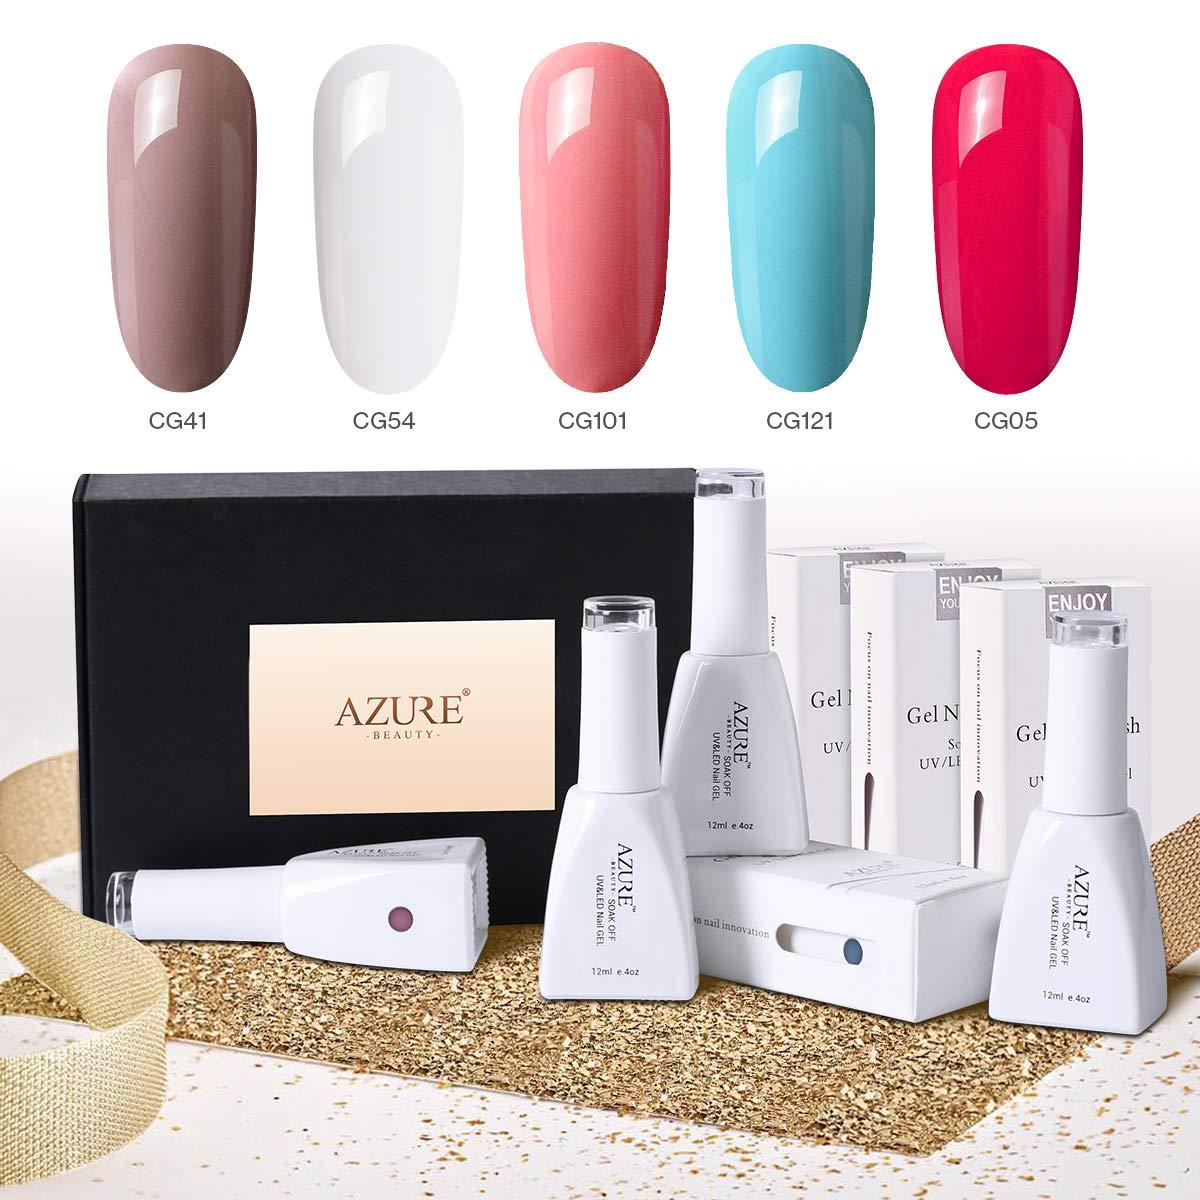 Gel Nail Polish Set with Gift Box(12ml) Bright Colors Soak Off UV LED Gel Polish Required Base and Top Coat